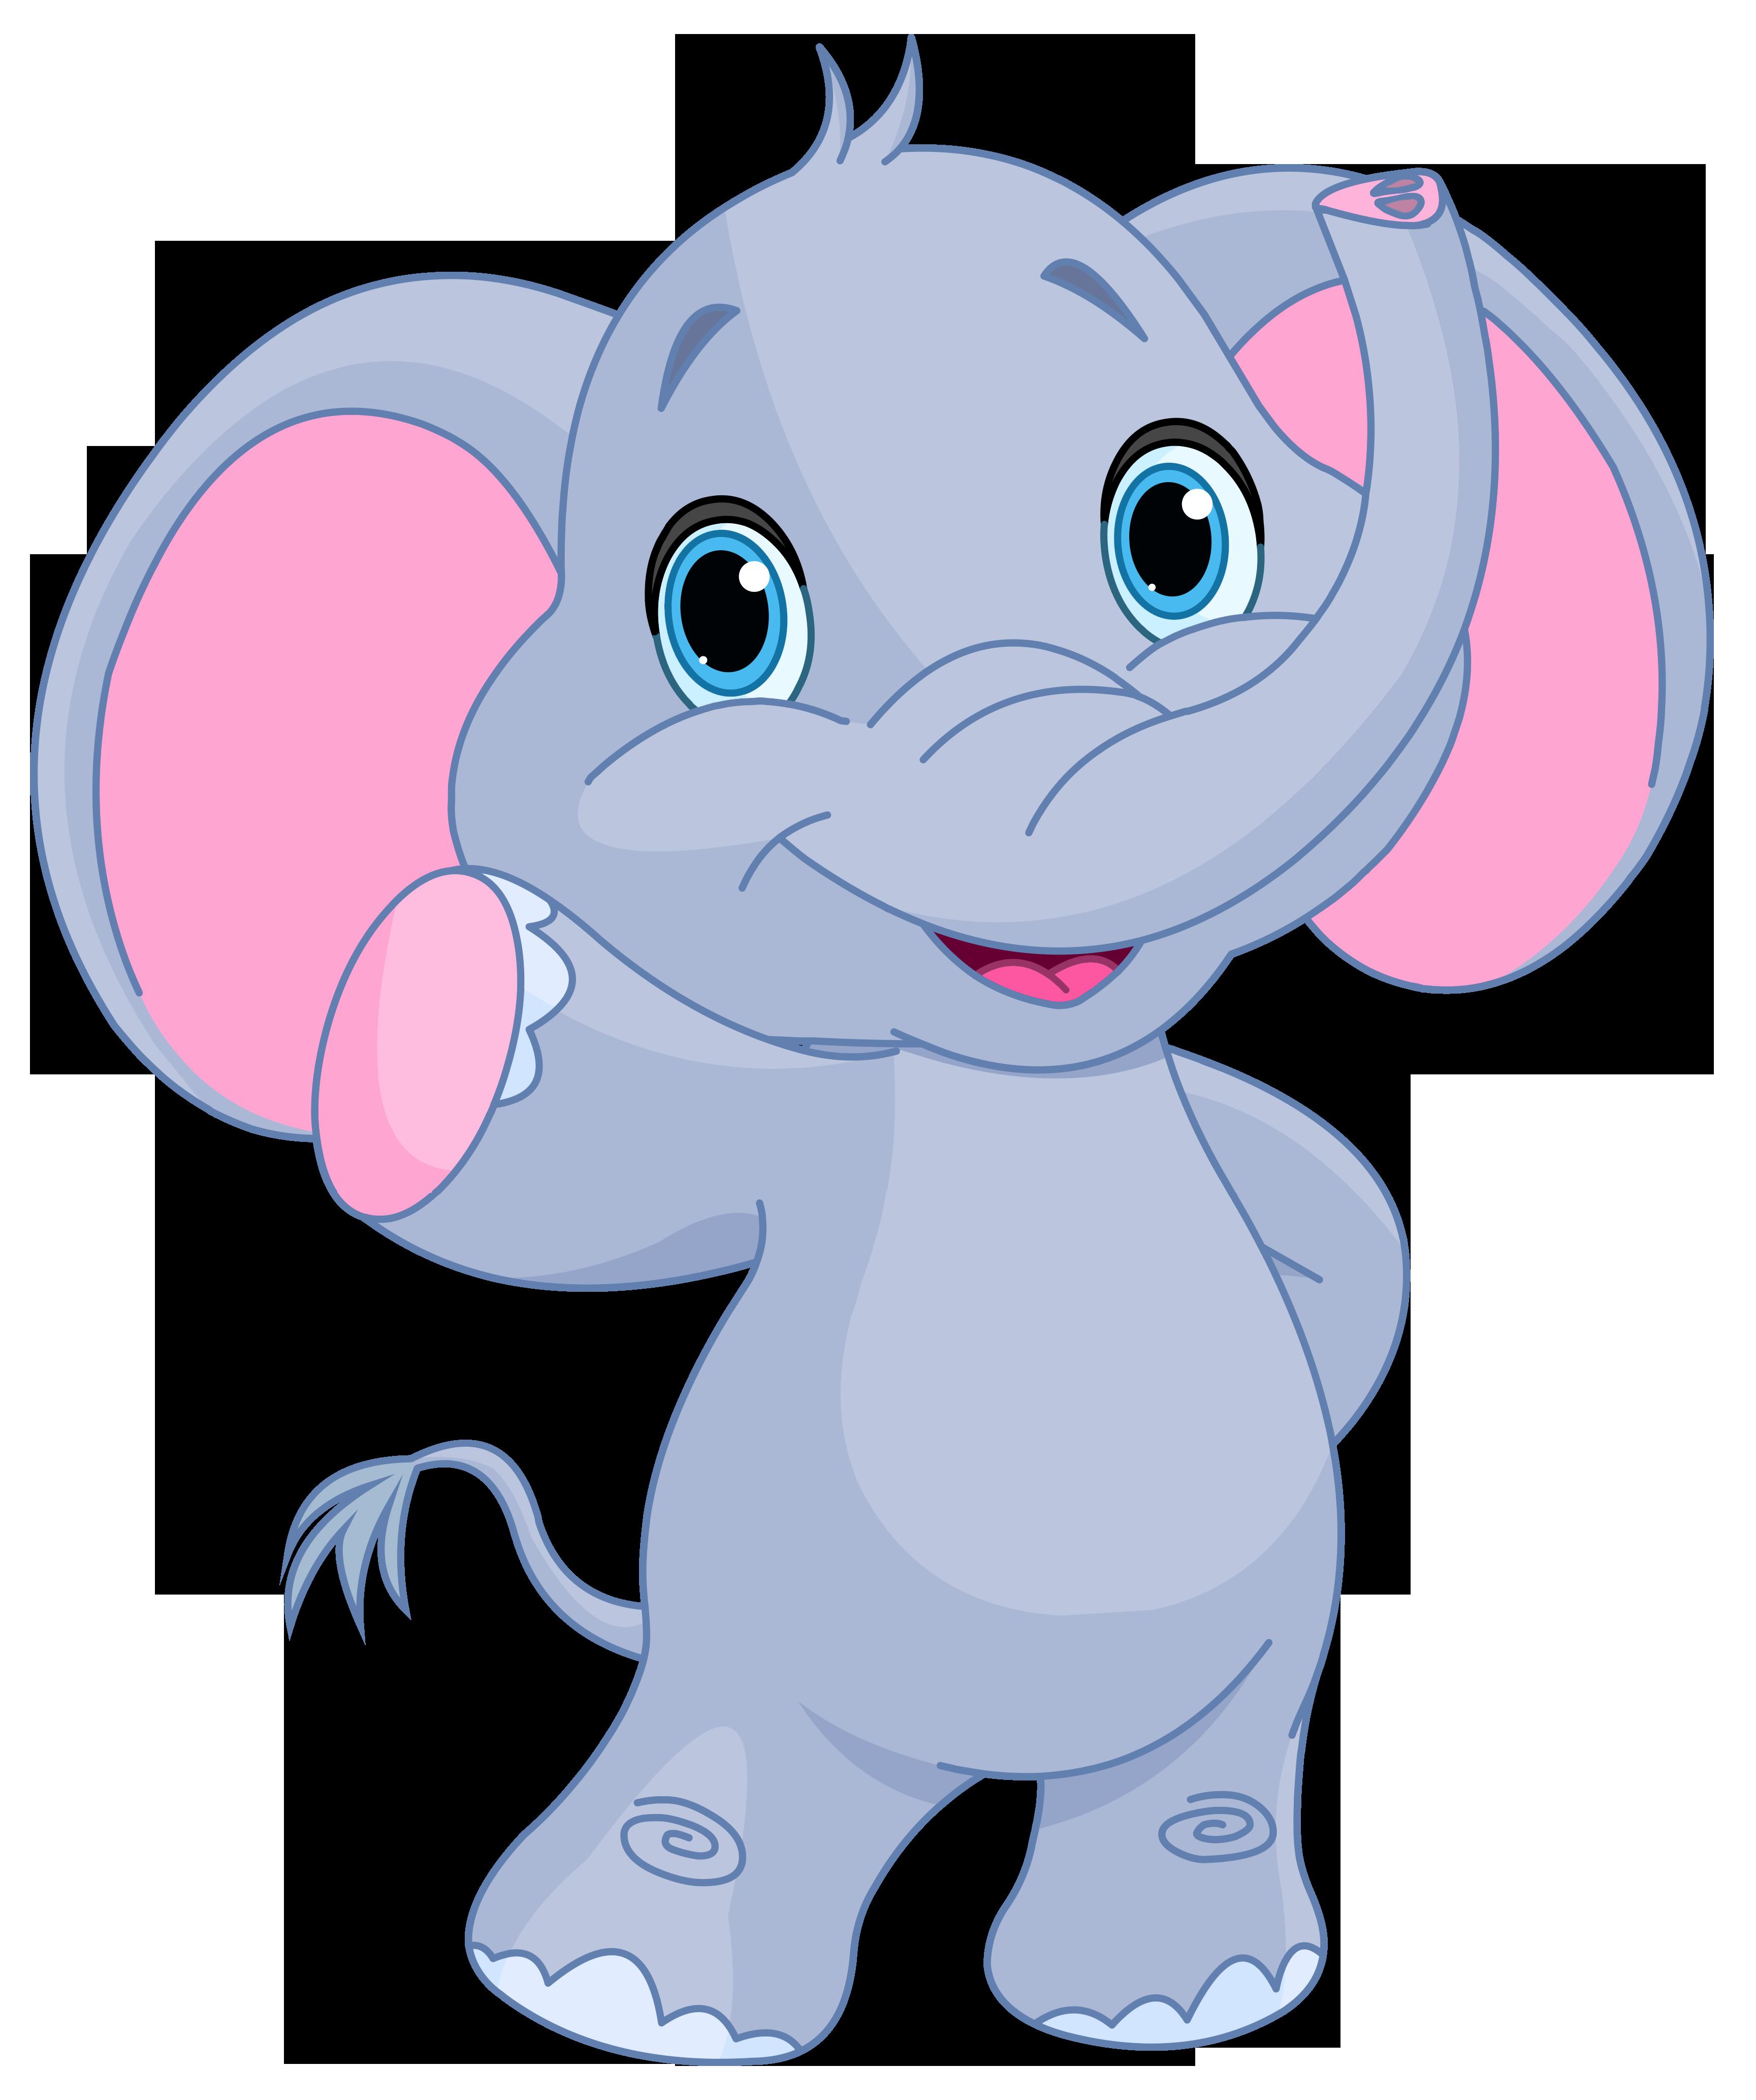 Baby christmas elephant clipart jpg free Cute elephant clipart image | GiRaFfE & eLePhAnT cLiP ArT | Cartoon ... jpg free